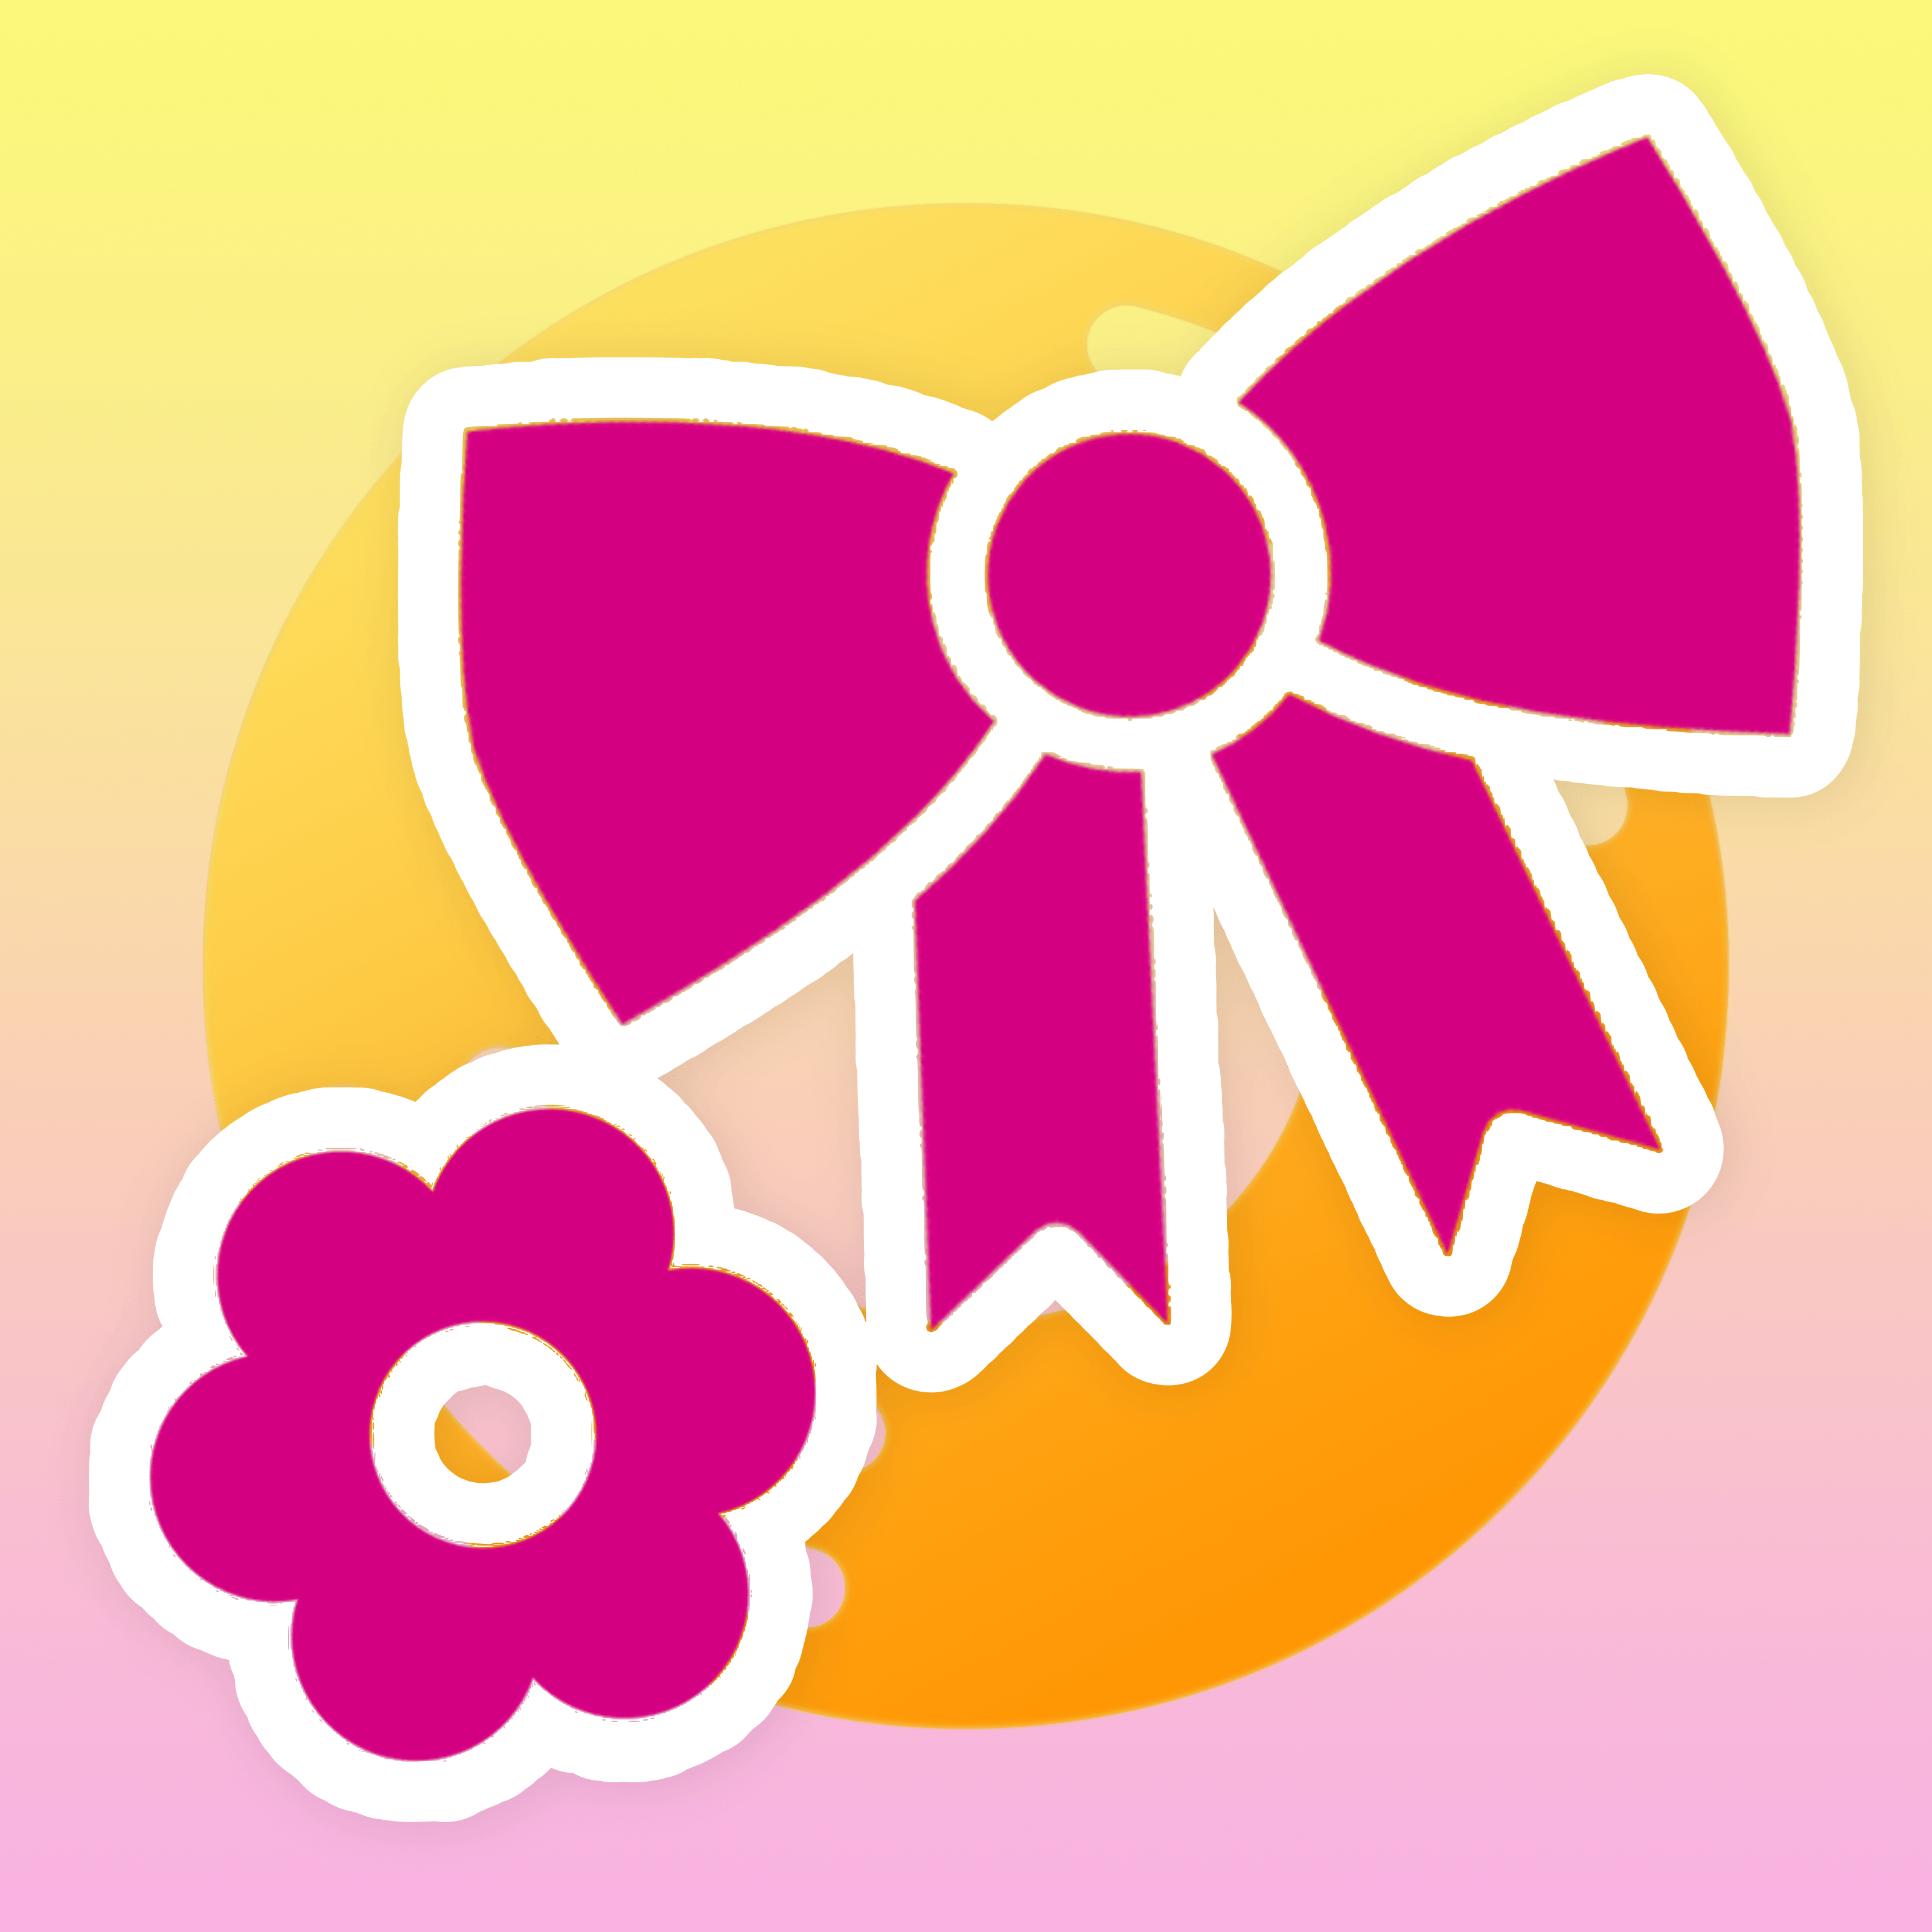 honk avatar